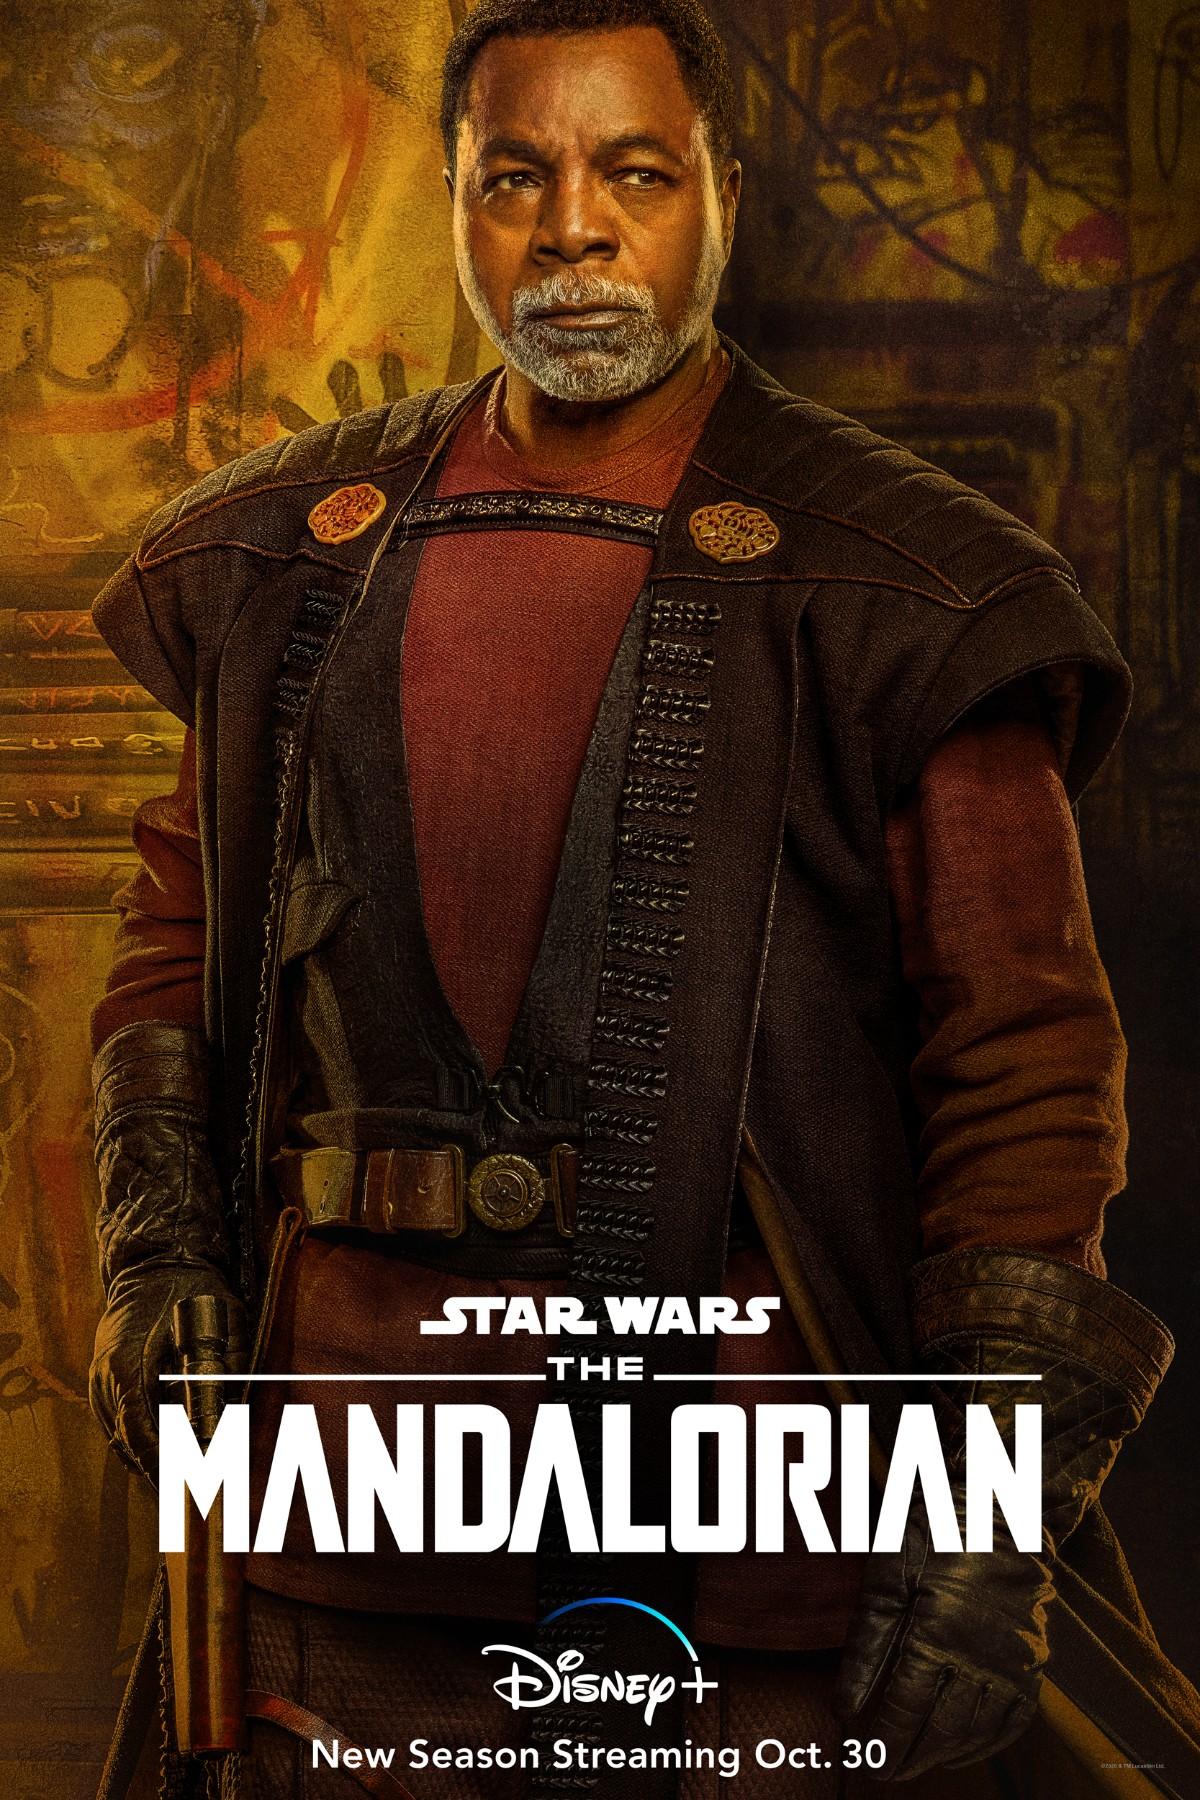 No Big Deal, Just Baby Yoda Looking Super Adorable Ahead Of The Mandalorian Season 2 #2478969